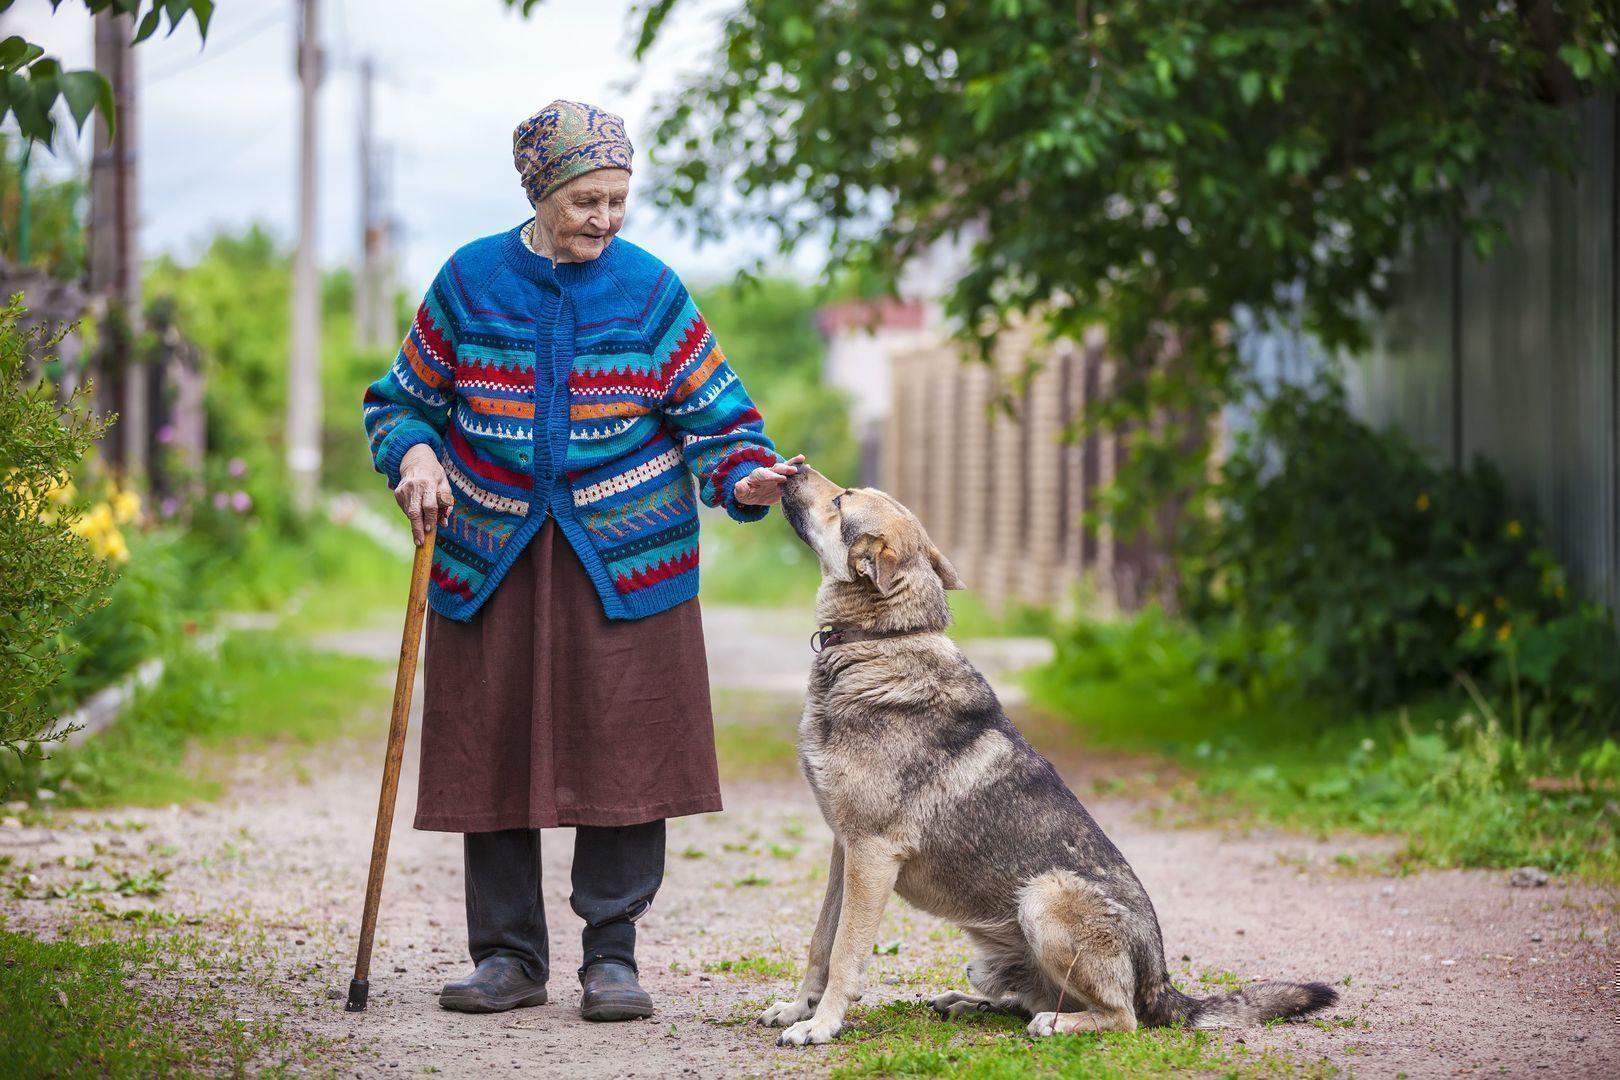 O idee despre adevaratii iubitori de animale